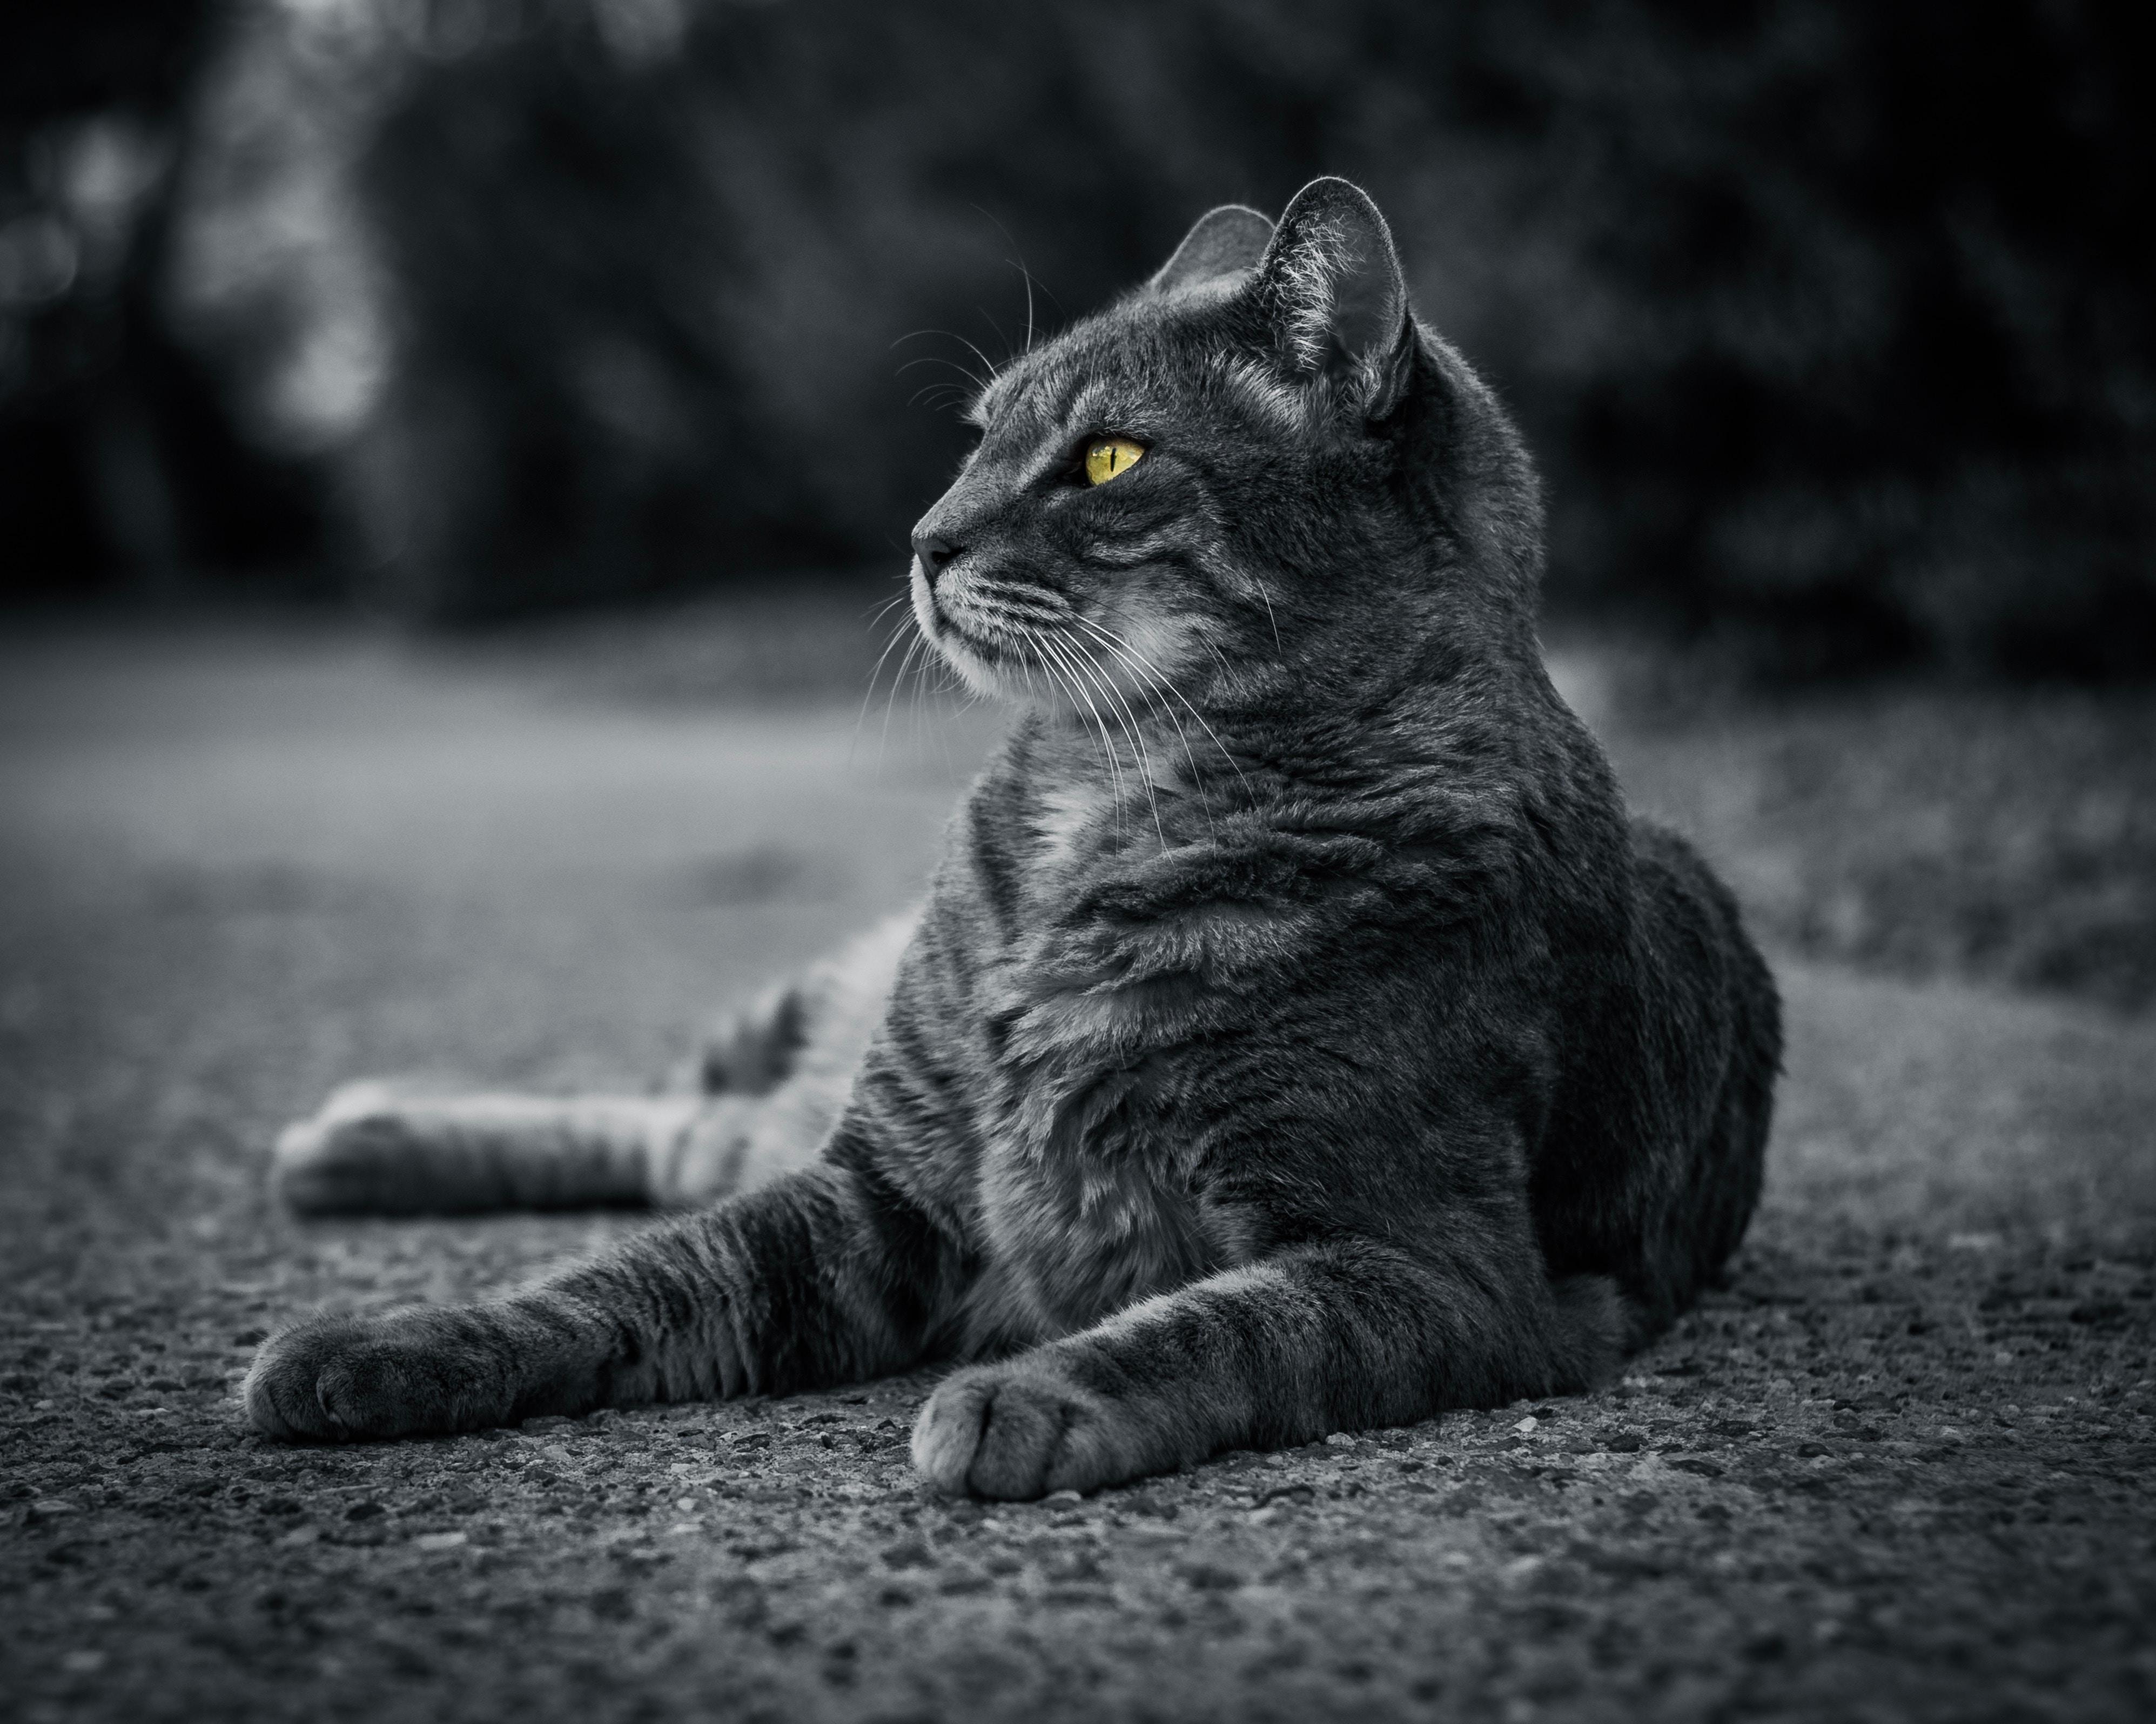 cat monochrome 1574938122 - Cat Monochrome -